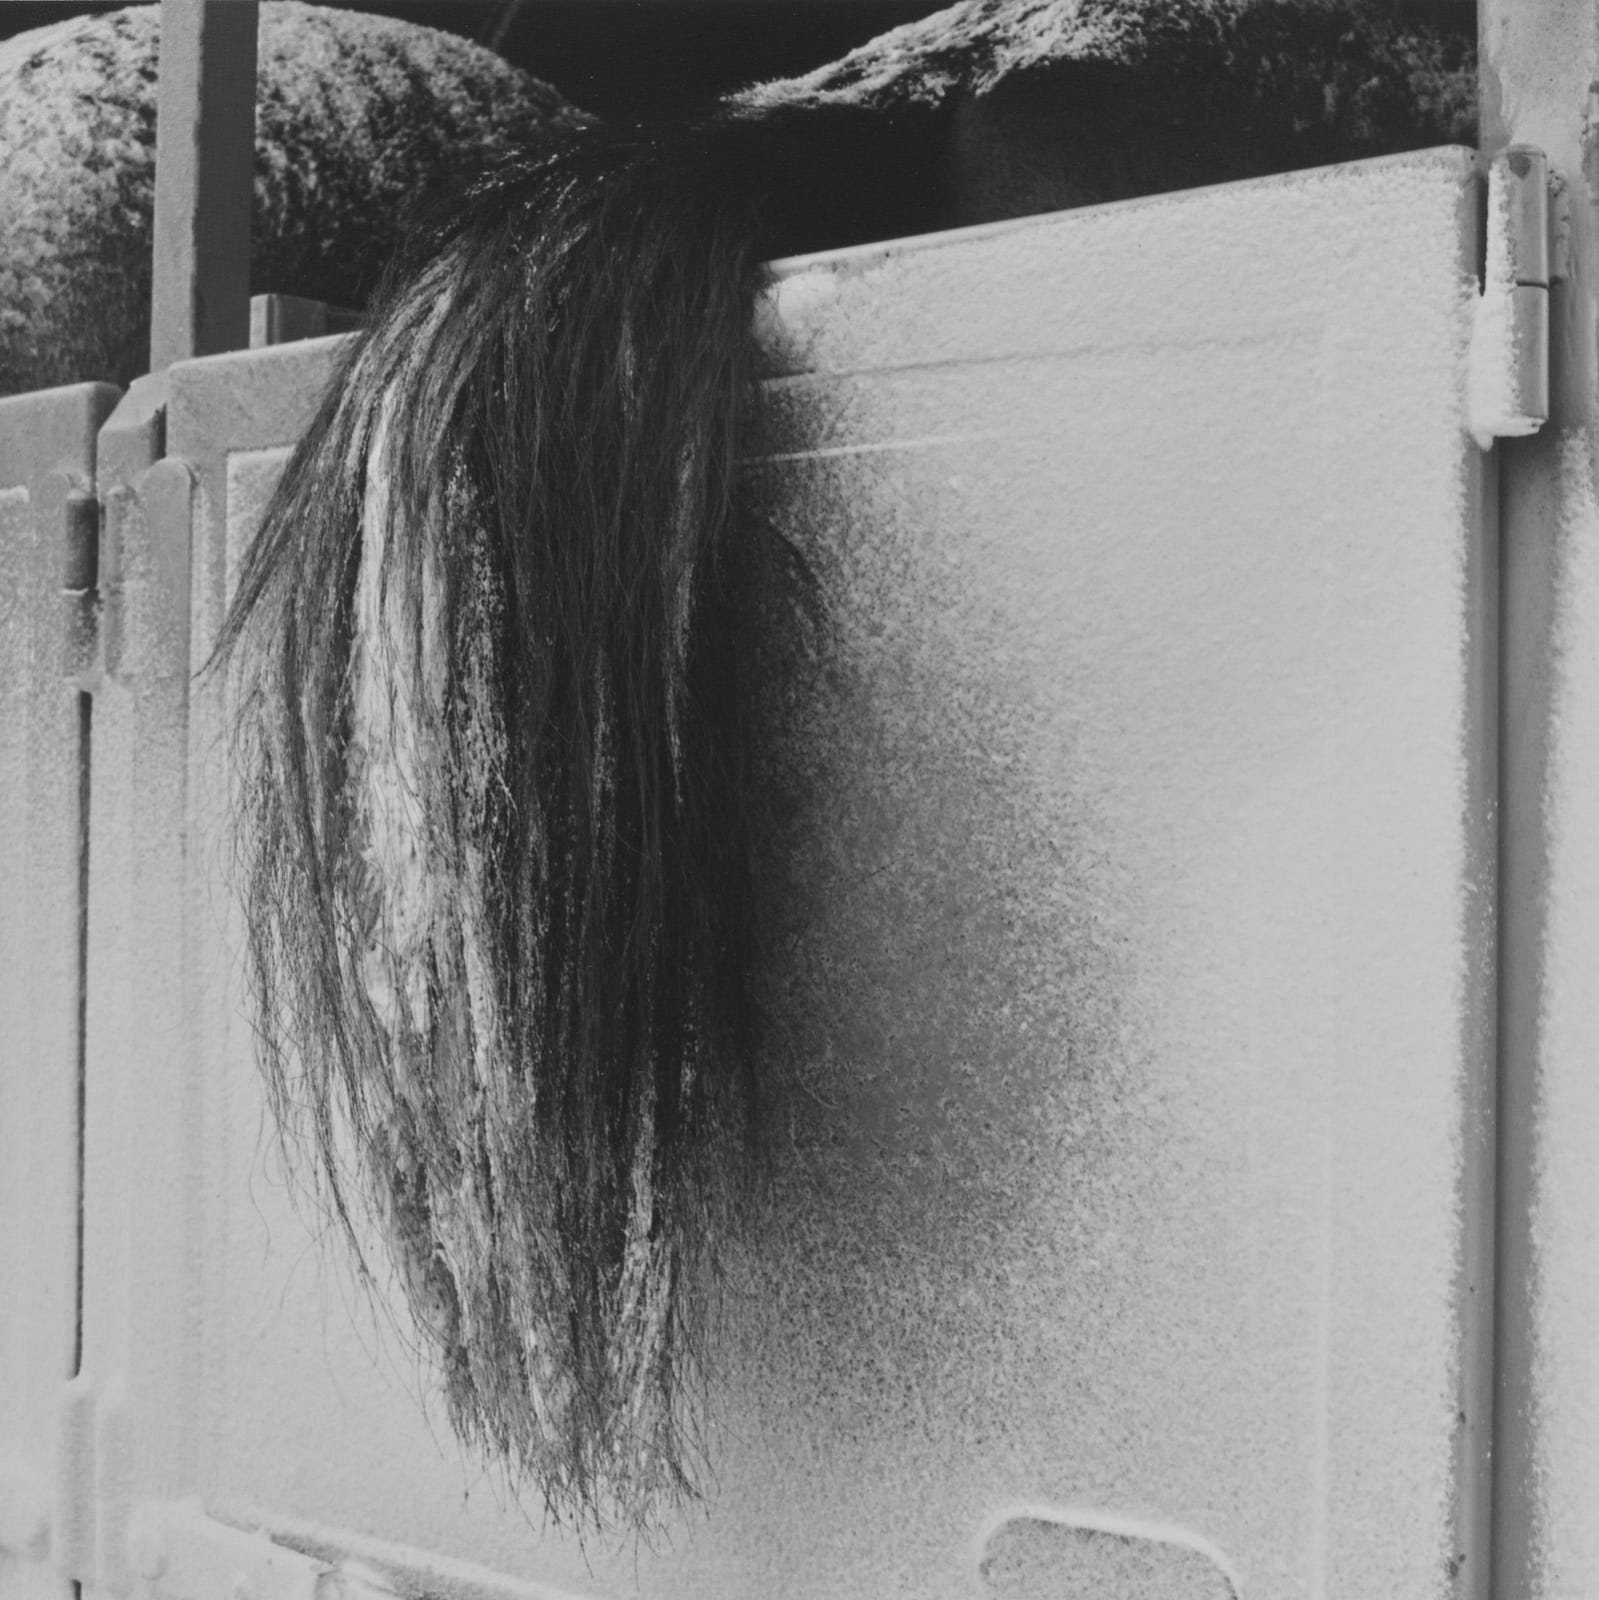 Steven Rifkin, Untitled, Colorado Springs, CO, 1975